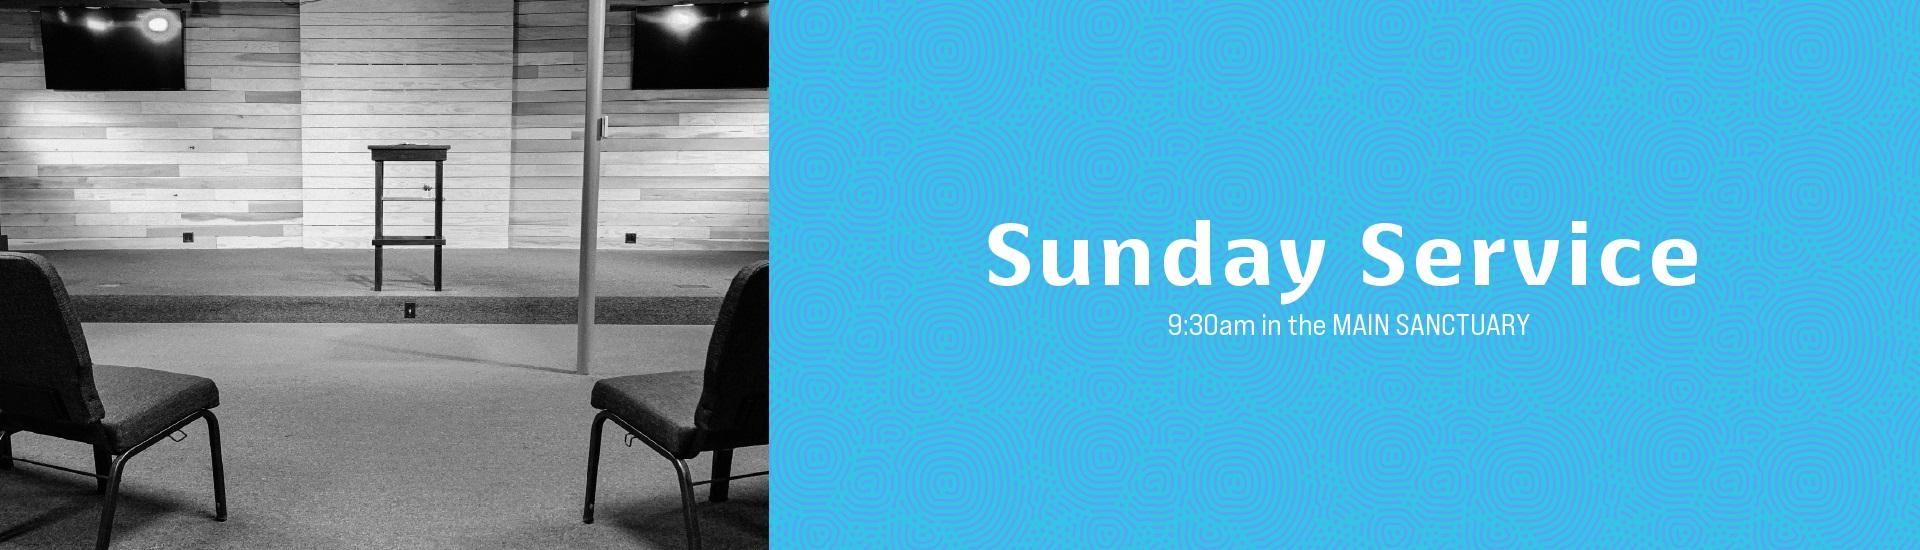 sunday-services-web.ban-v1.2